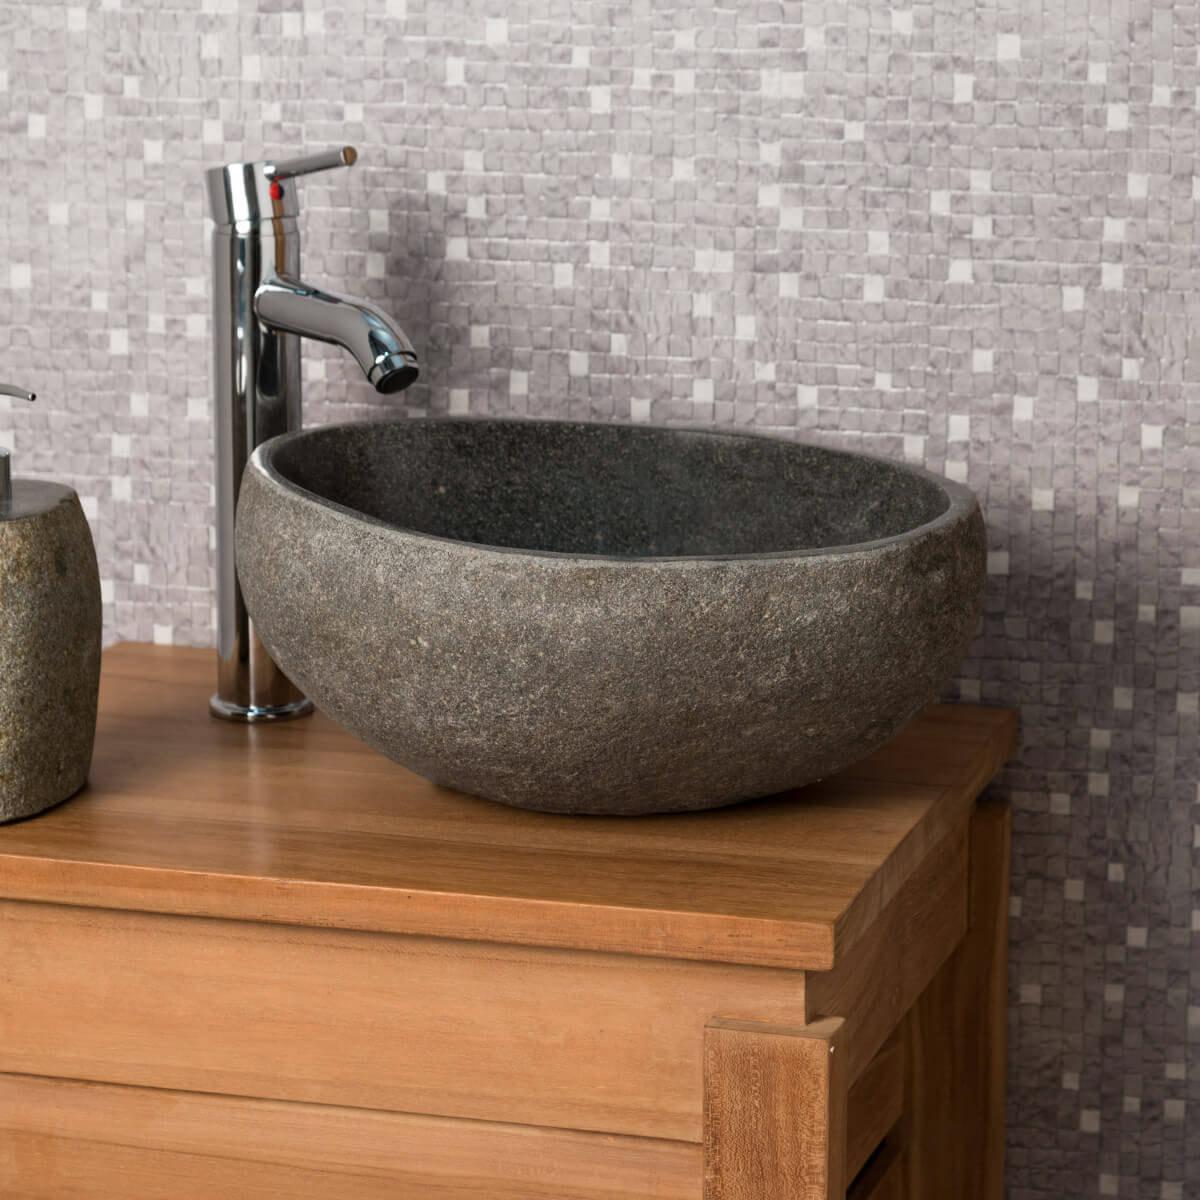 lave mains de wc poser en galet de rivi re naturel rond d 30 cm. Black Bedroom Furniture Sets. Home Design Ideas